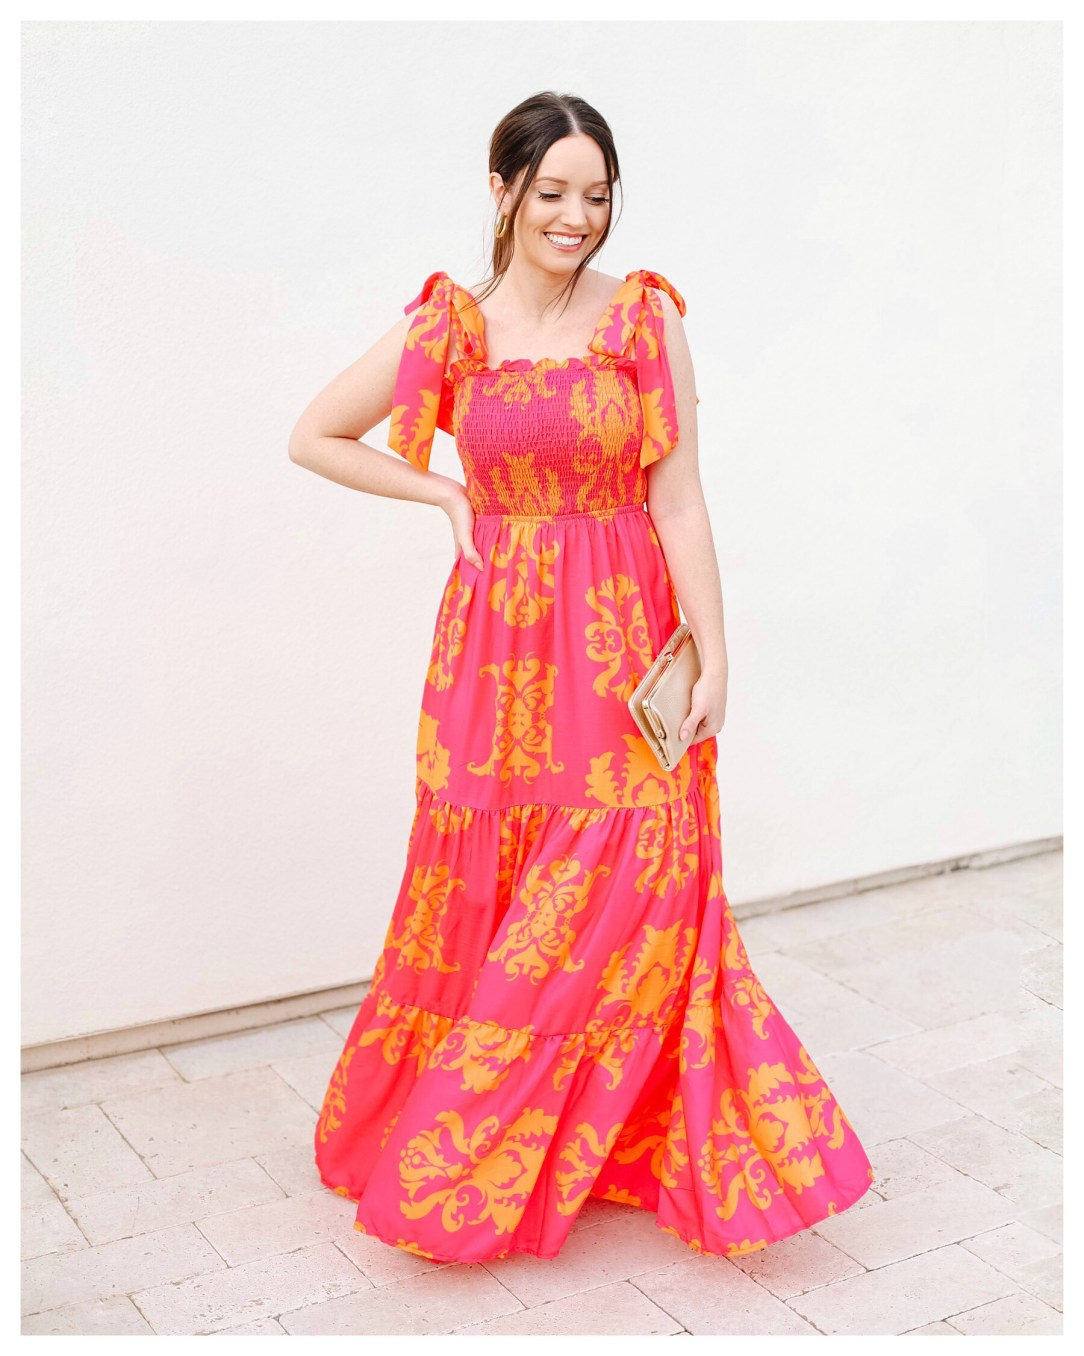 Red Dress On Five Foot Feminine